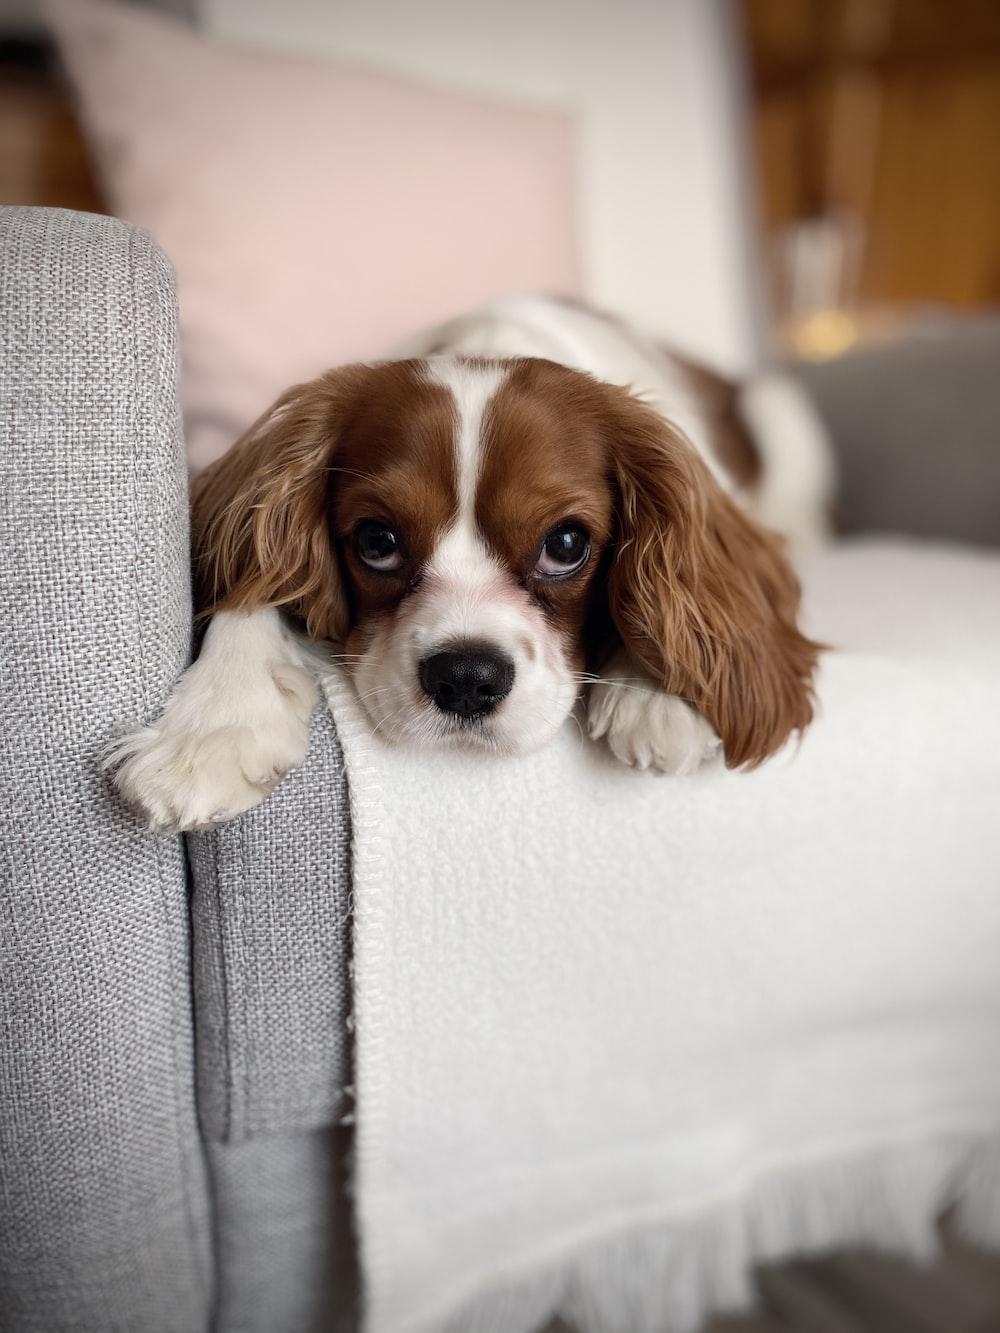 long-coated white and tan dog lying on sofa chair